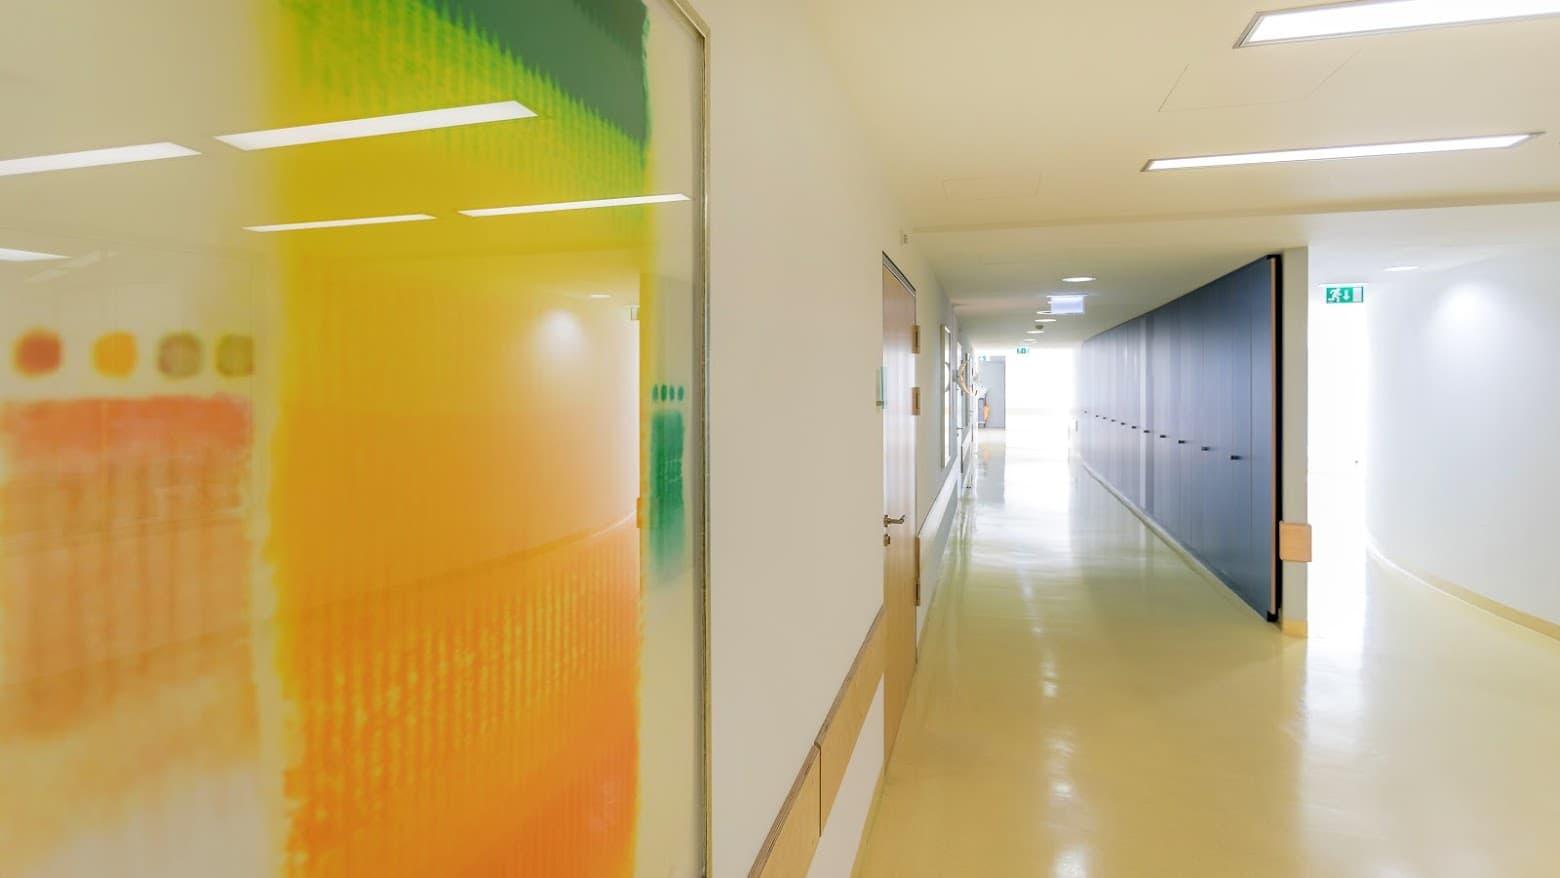 Pan Klinik Köln Kinderwunsch